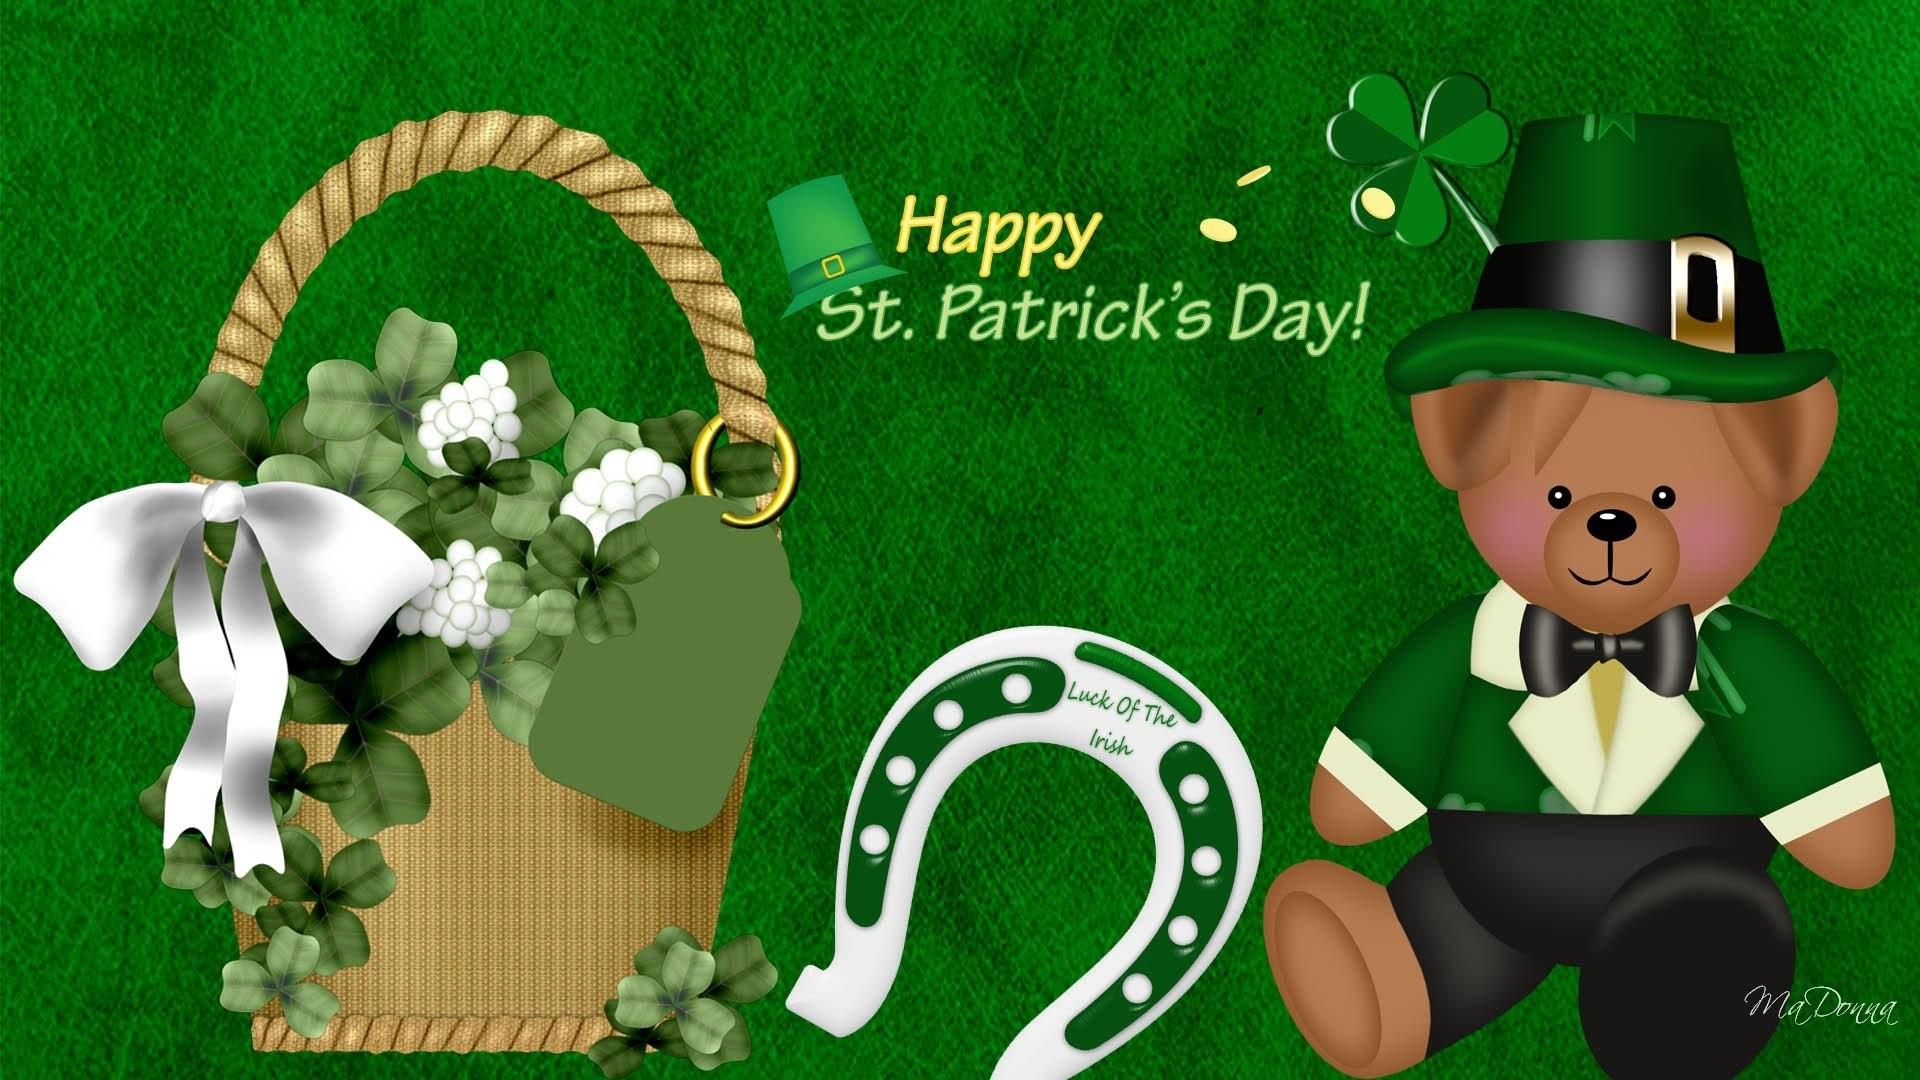 Saint Patrick Day Wallpaper (62+ images)